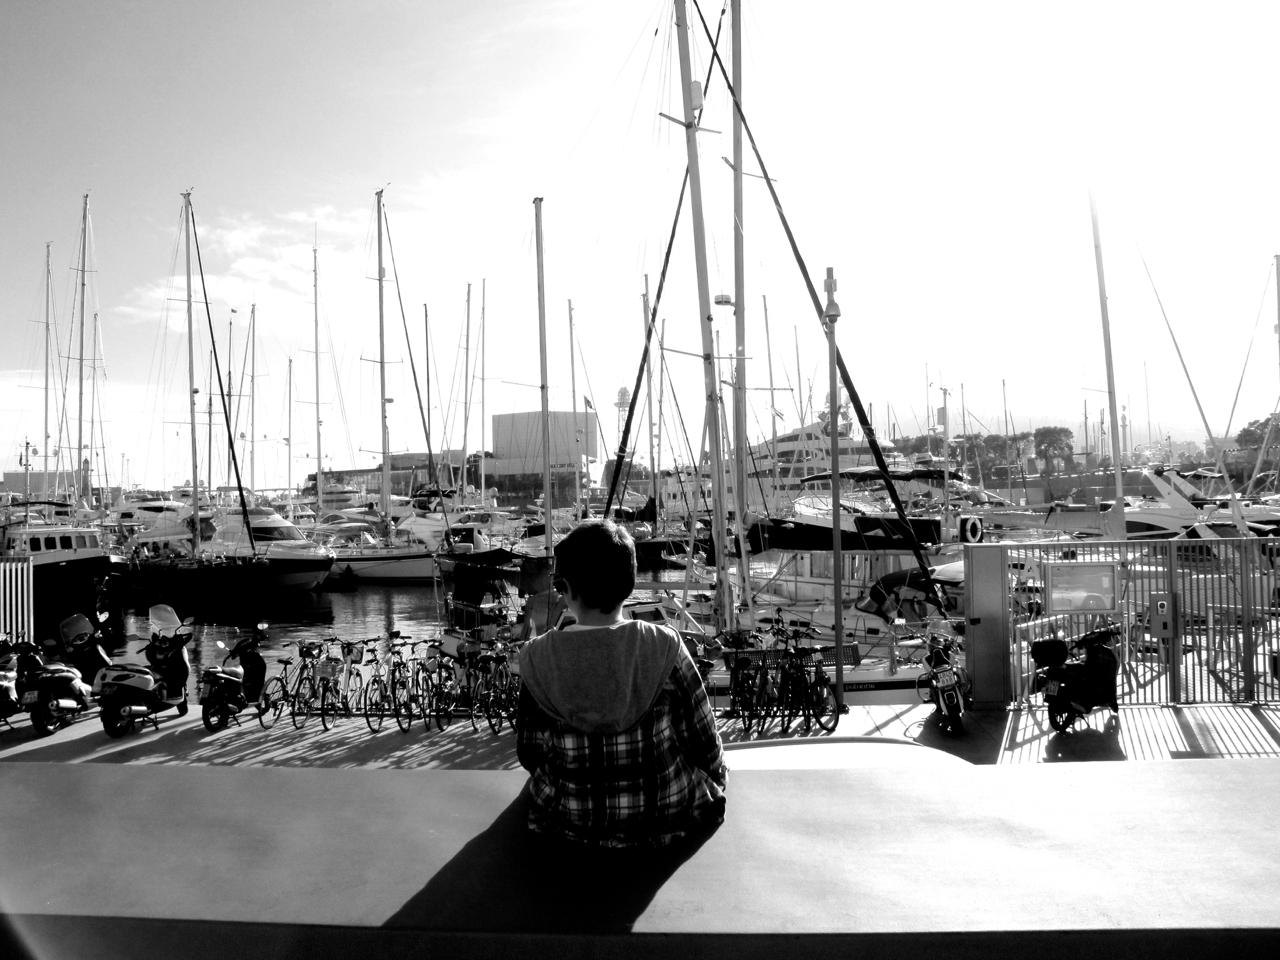 Port Olympico Barcelonas Yachthafen